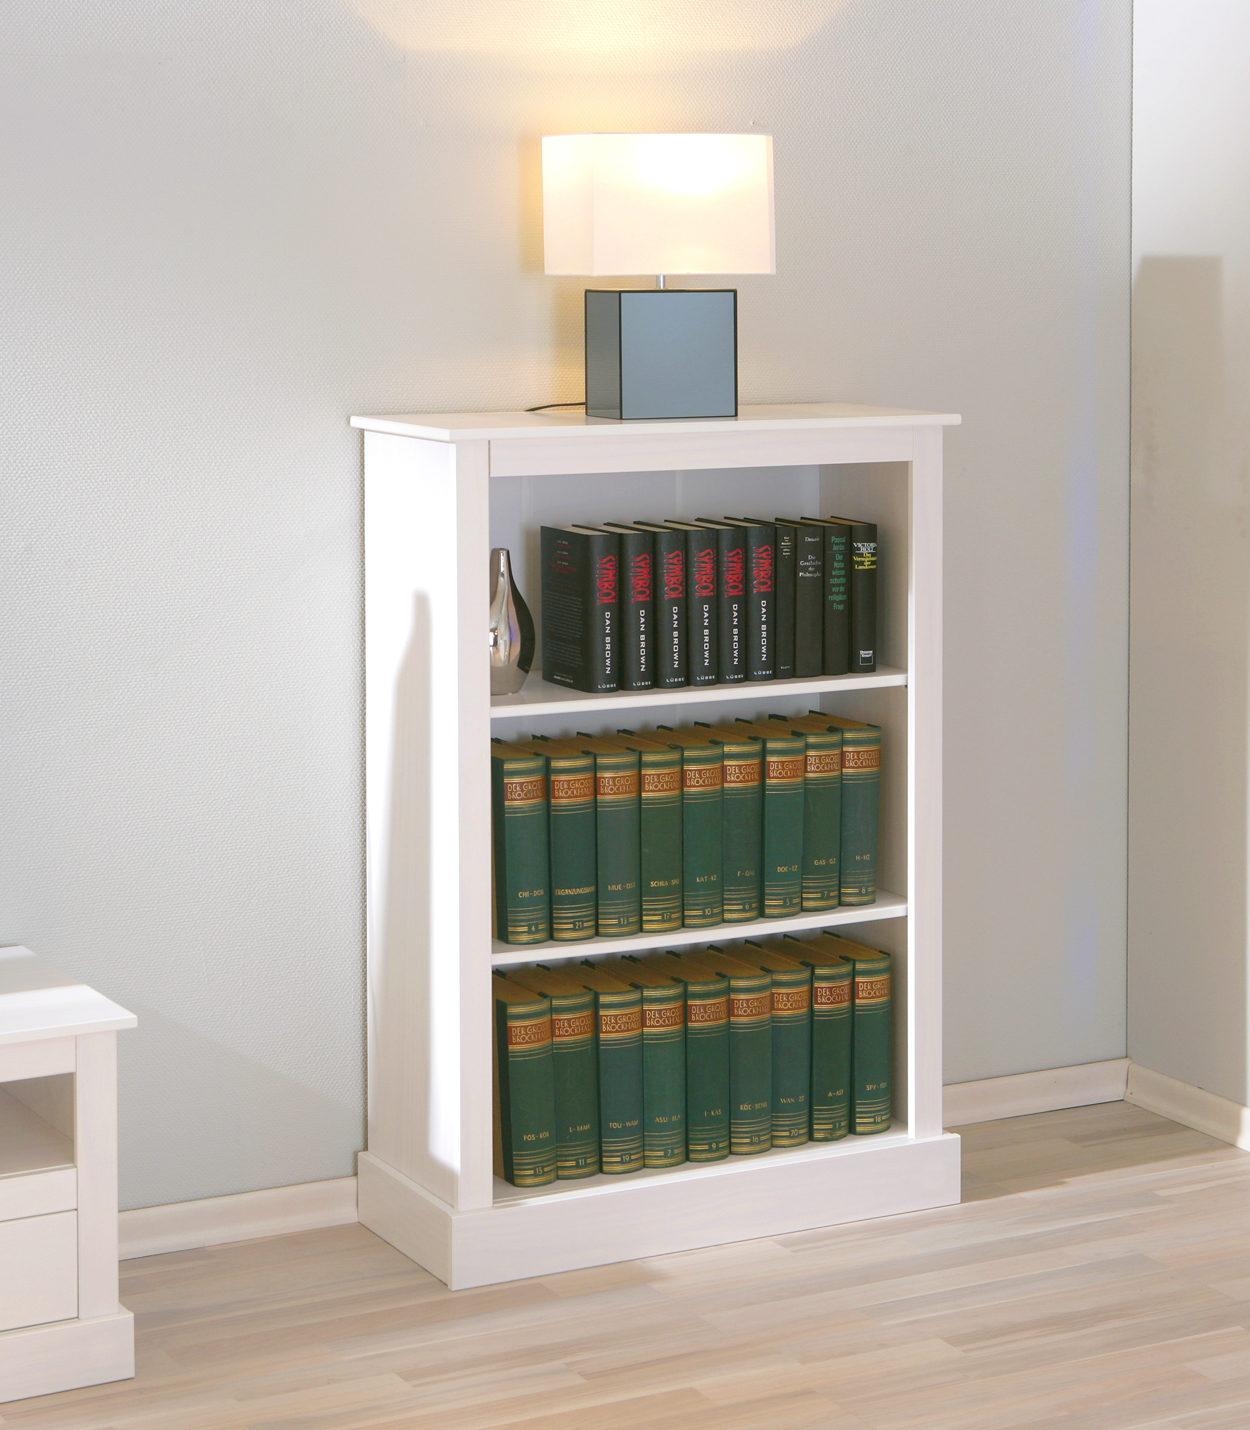 Möbel Bohn Crailsheim, Möbel A-Z, Regale + Raumteiler, Bücherregale ...